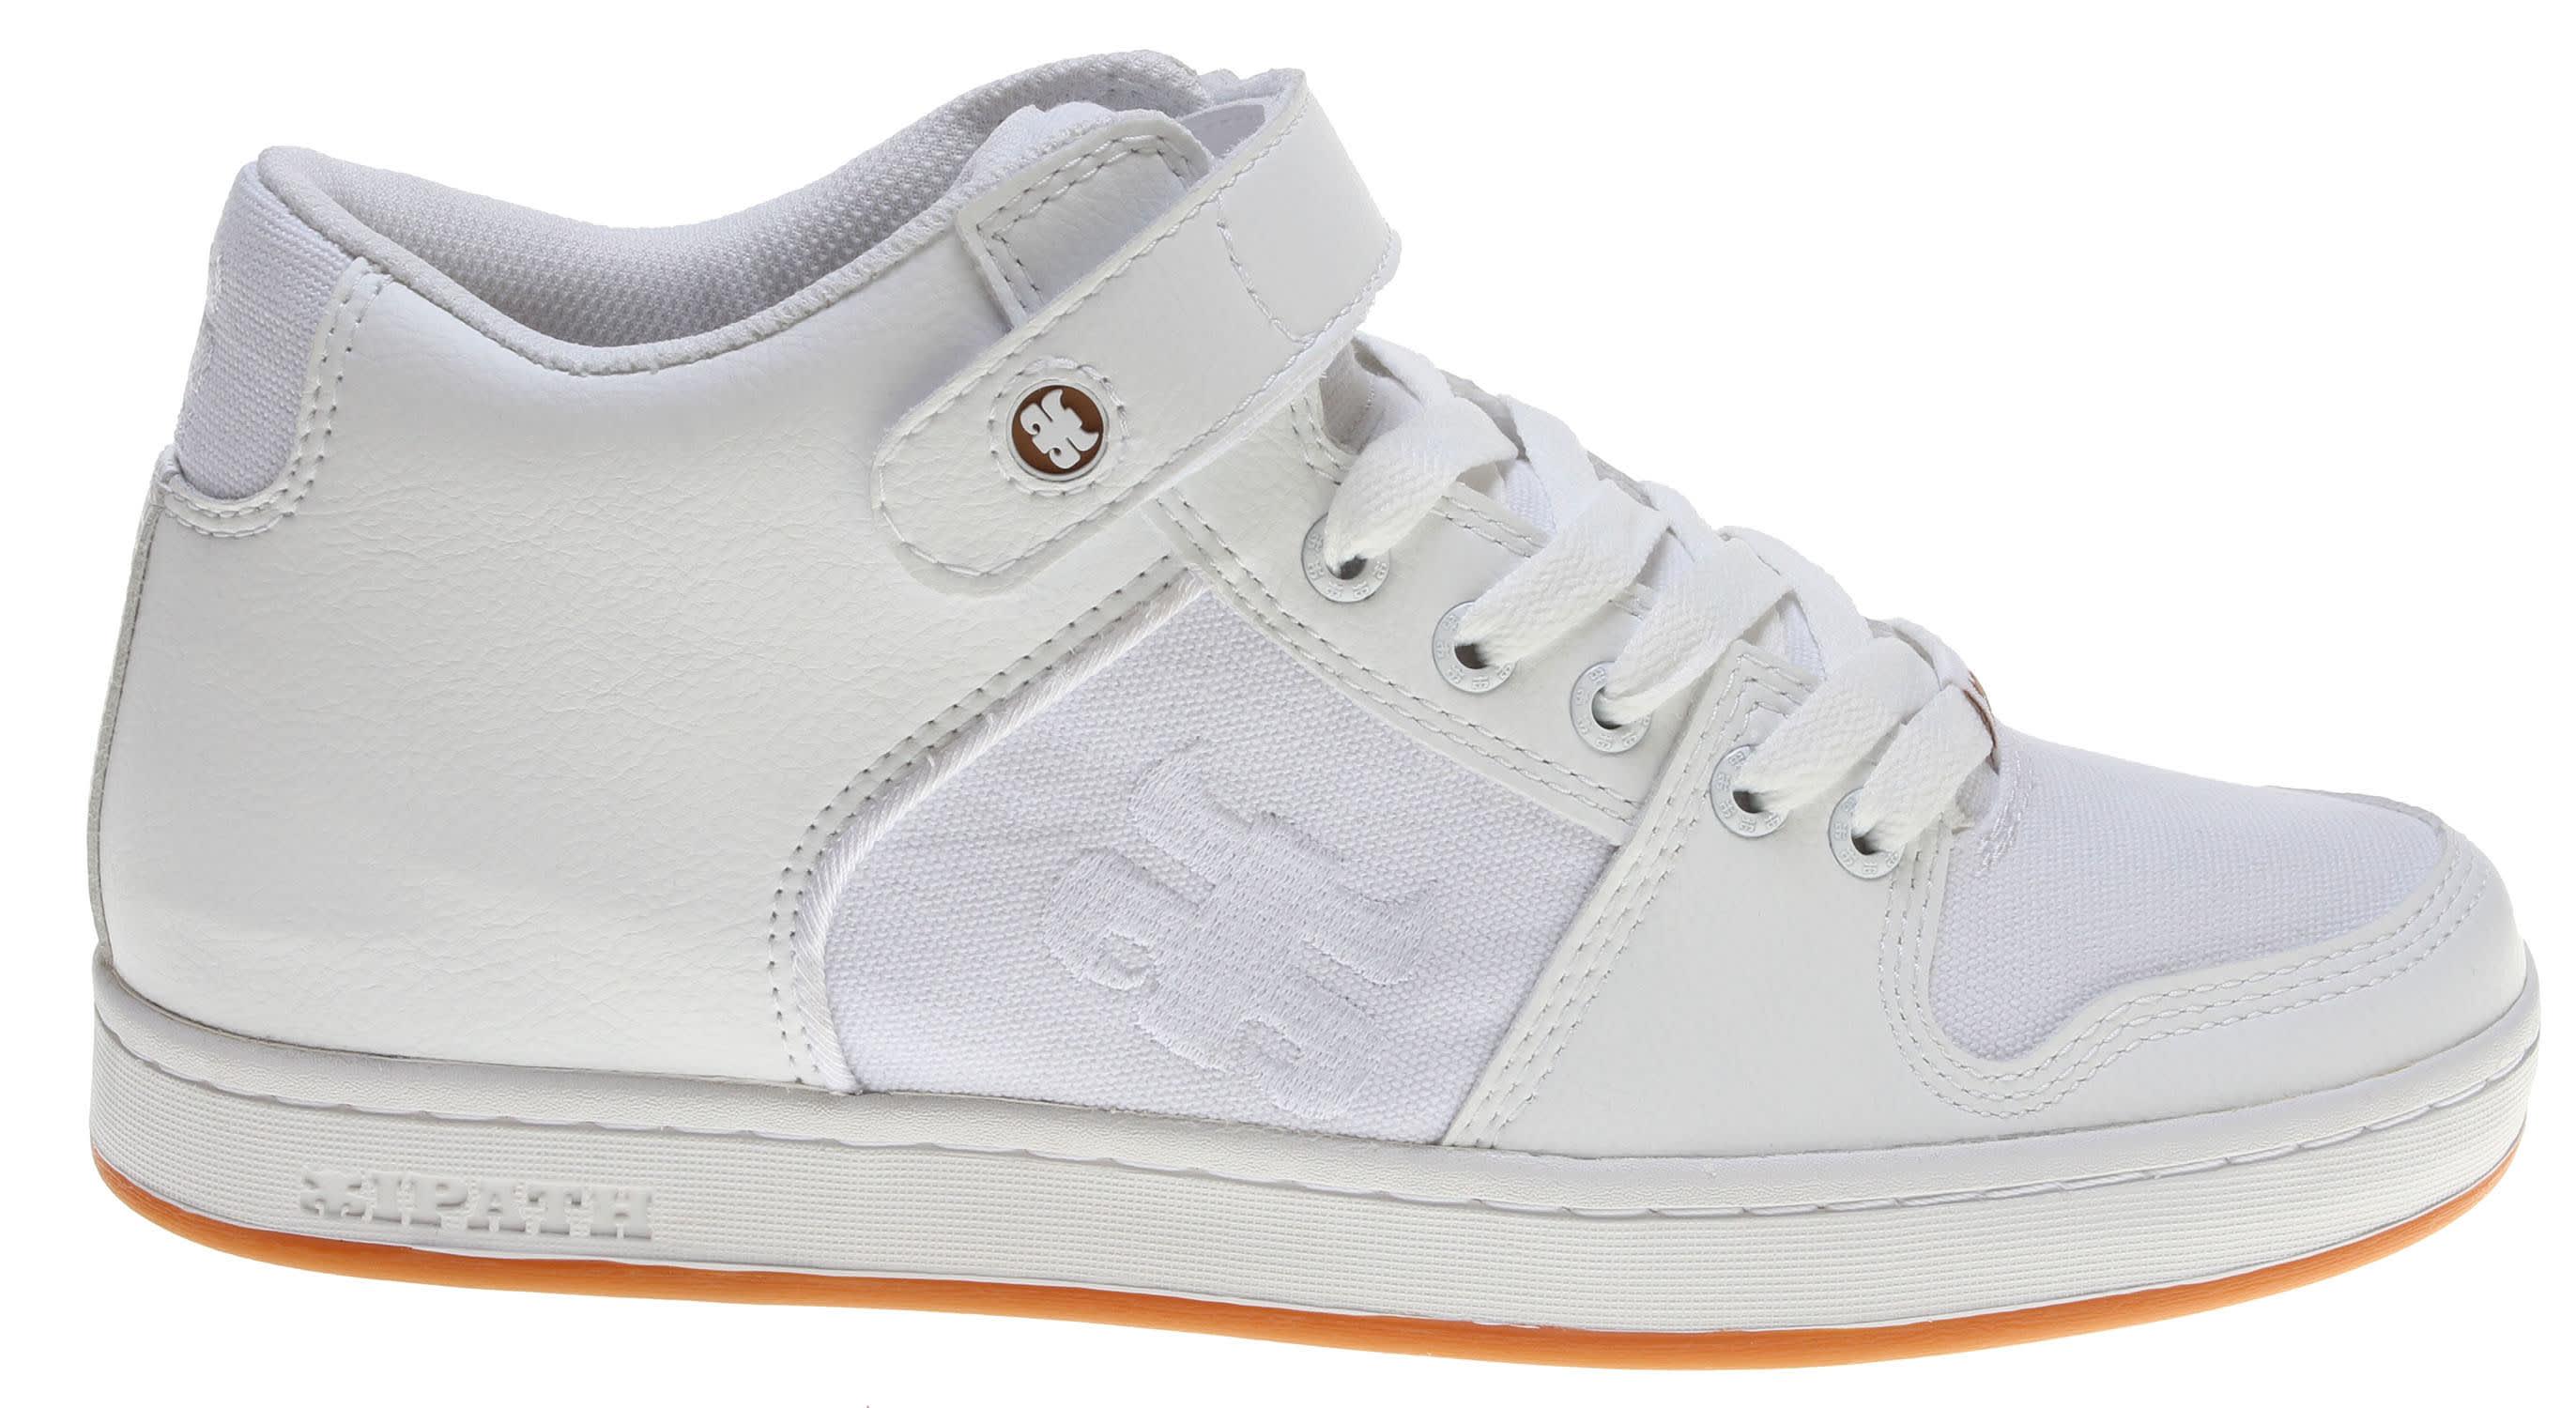 Ipath Grasshopper Skate Shoes